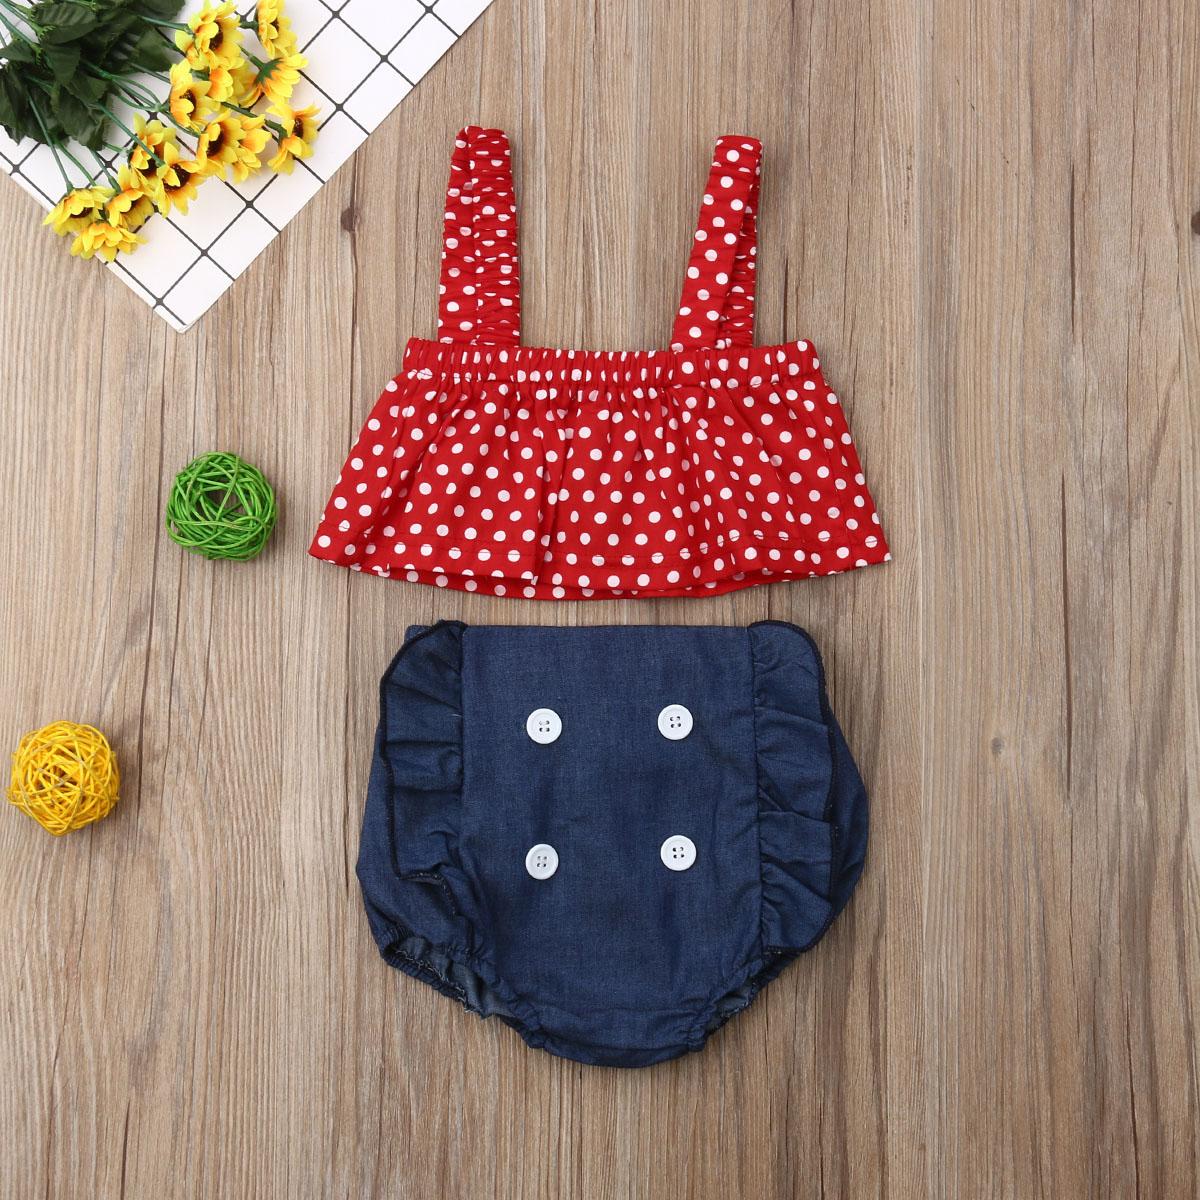 Pudcoco Summer Newborn Baby Girl Clothes Polka Dot Strap Cropped Tops Denim Short Bib Pants 2Pcs Outfits Cotton Clothes